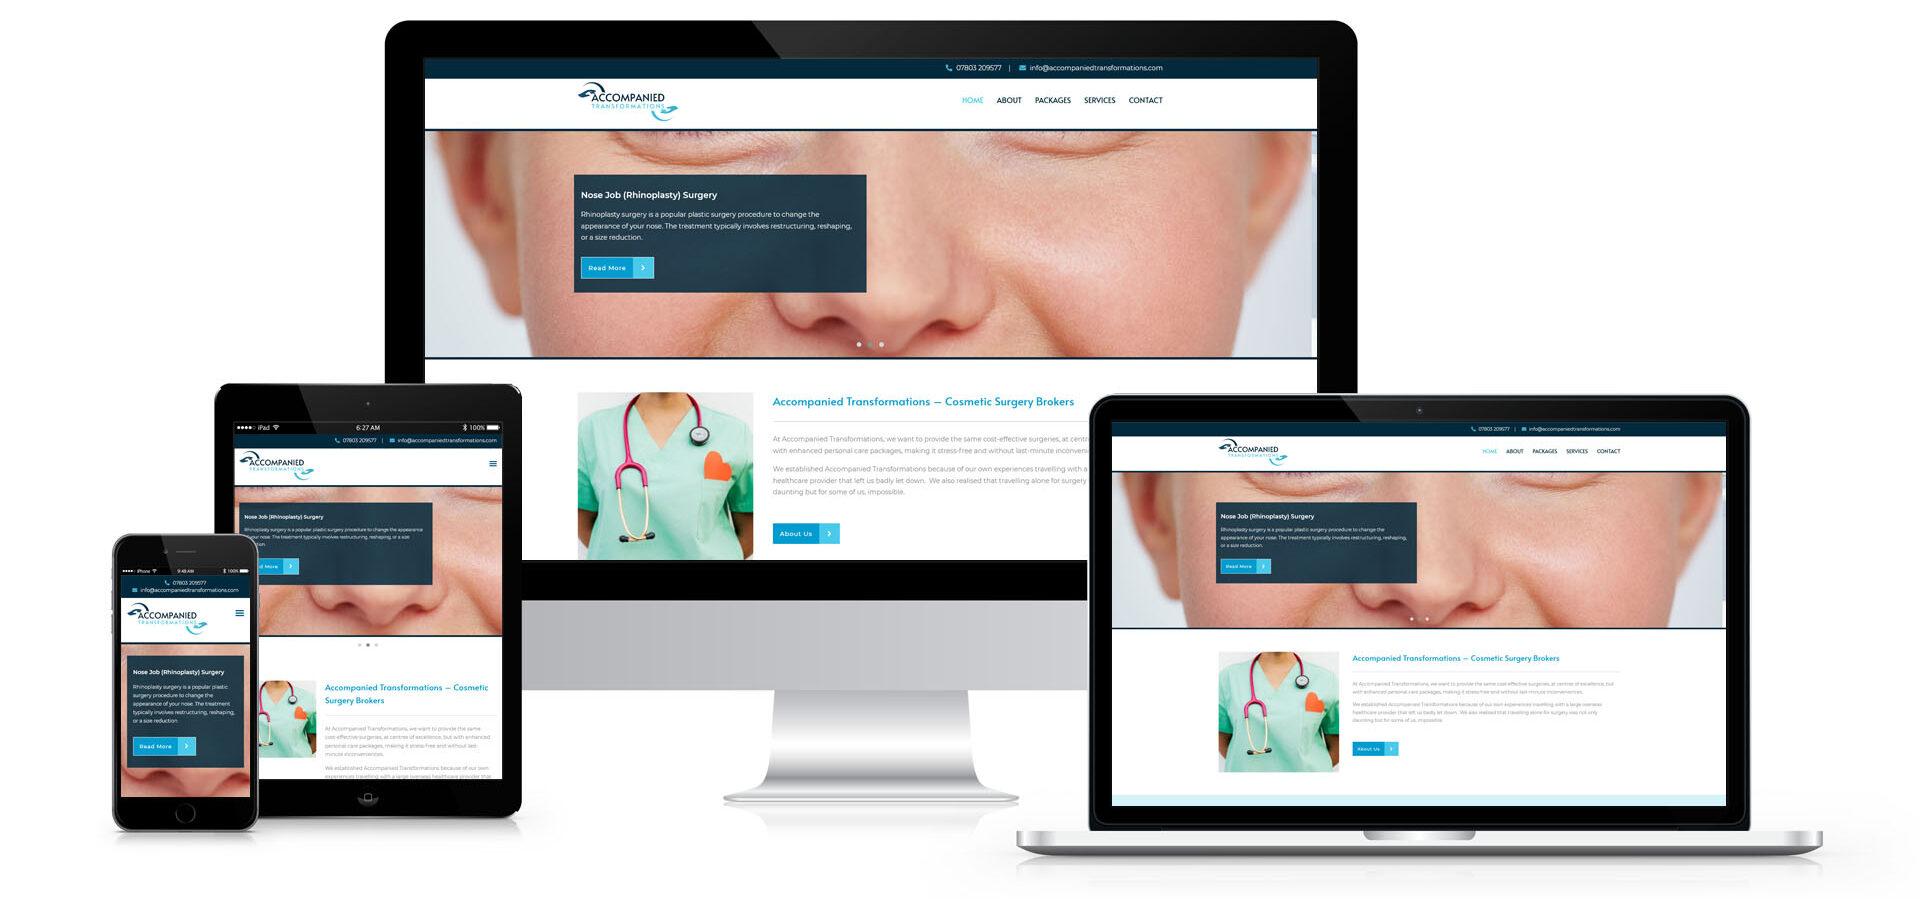 Accompnaied Transformations Responsive Website